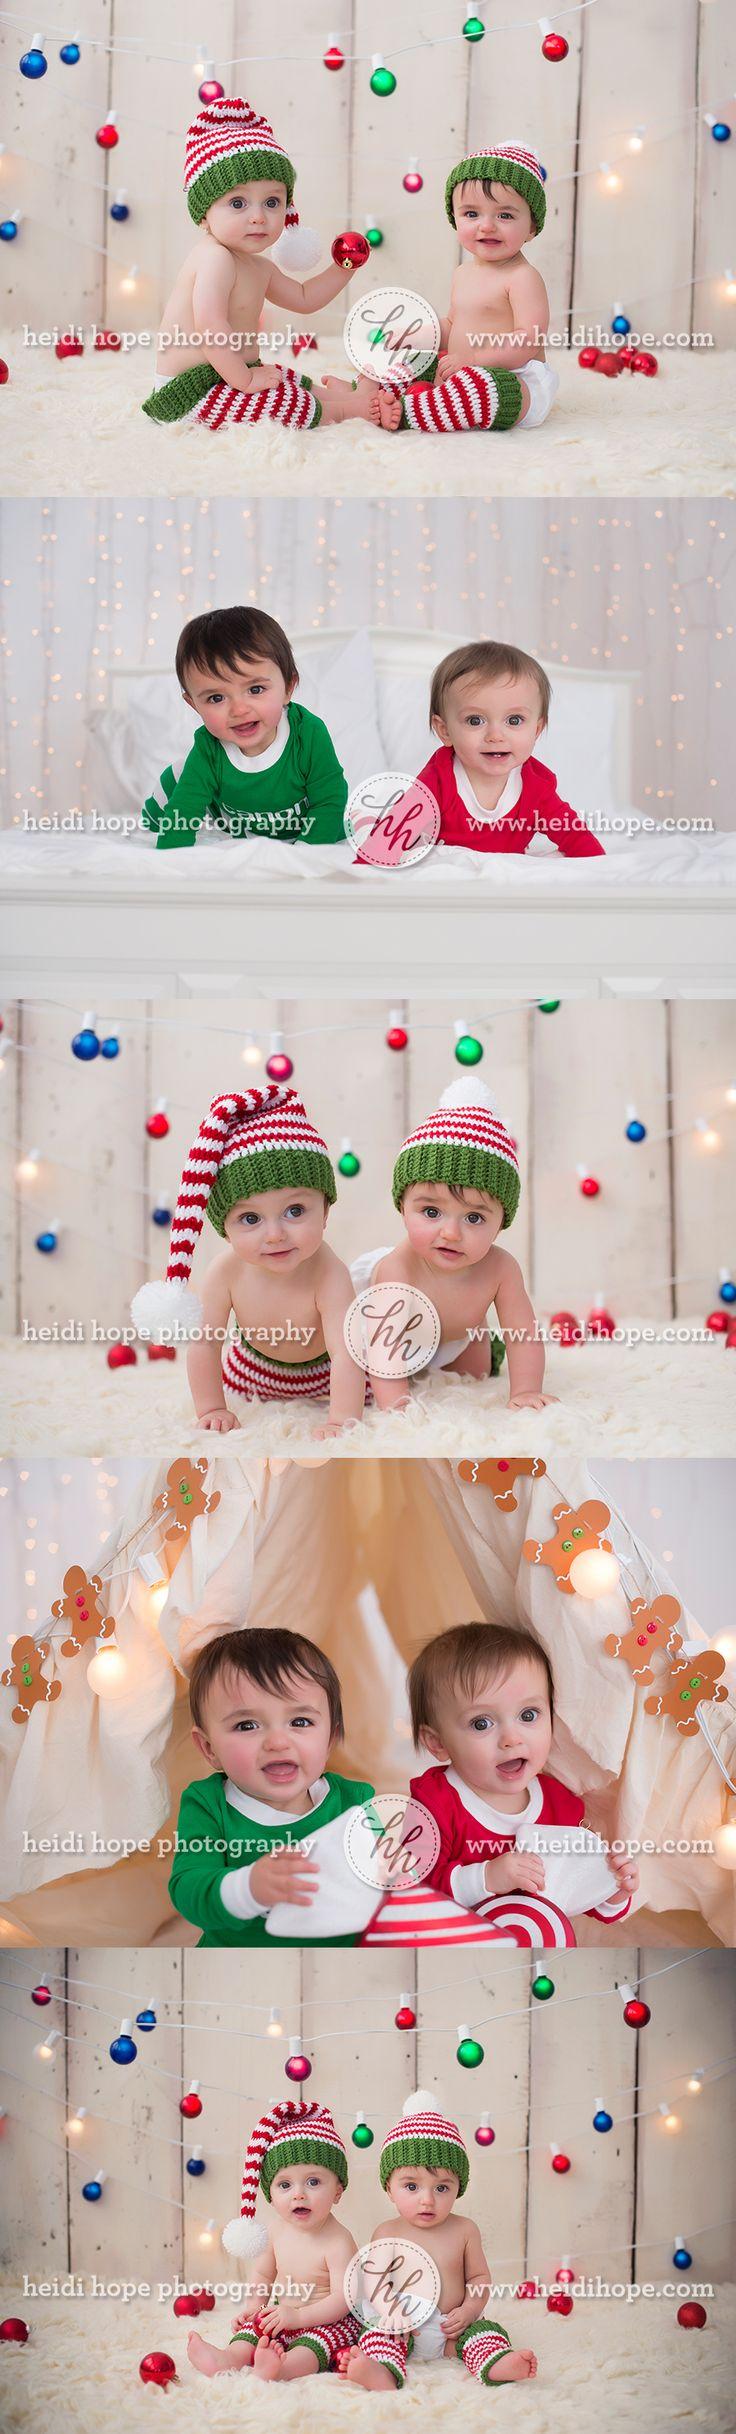 A sneak peek of the V twins holiday christmas card portrait session! | Heidi Hope Photography